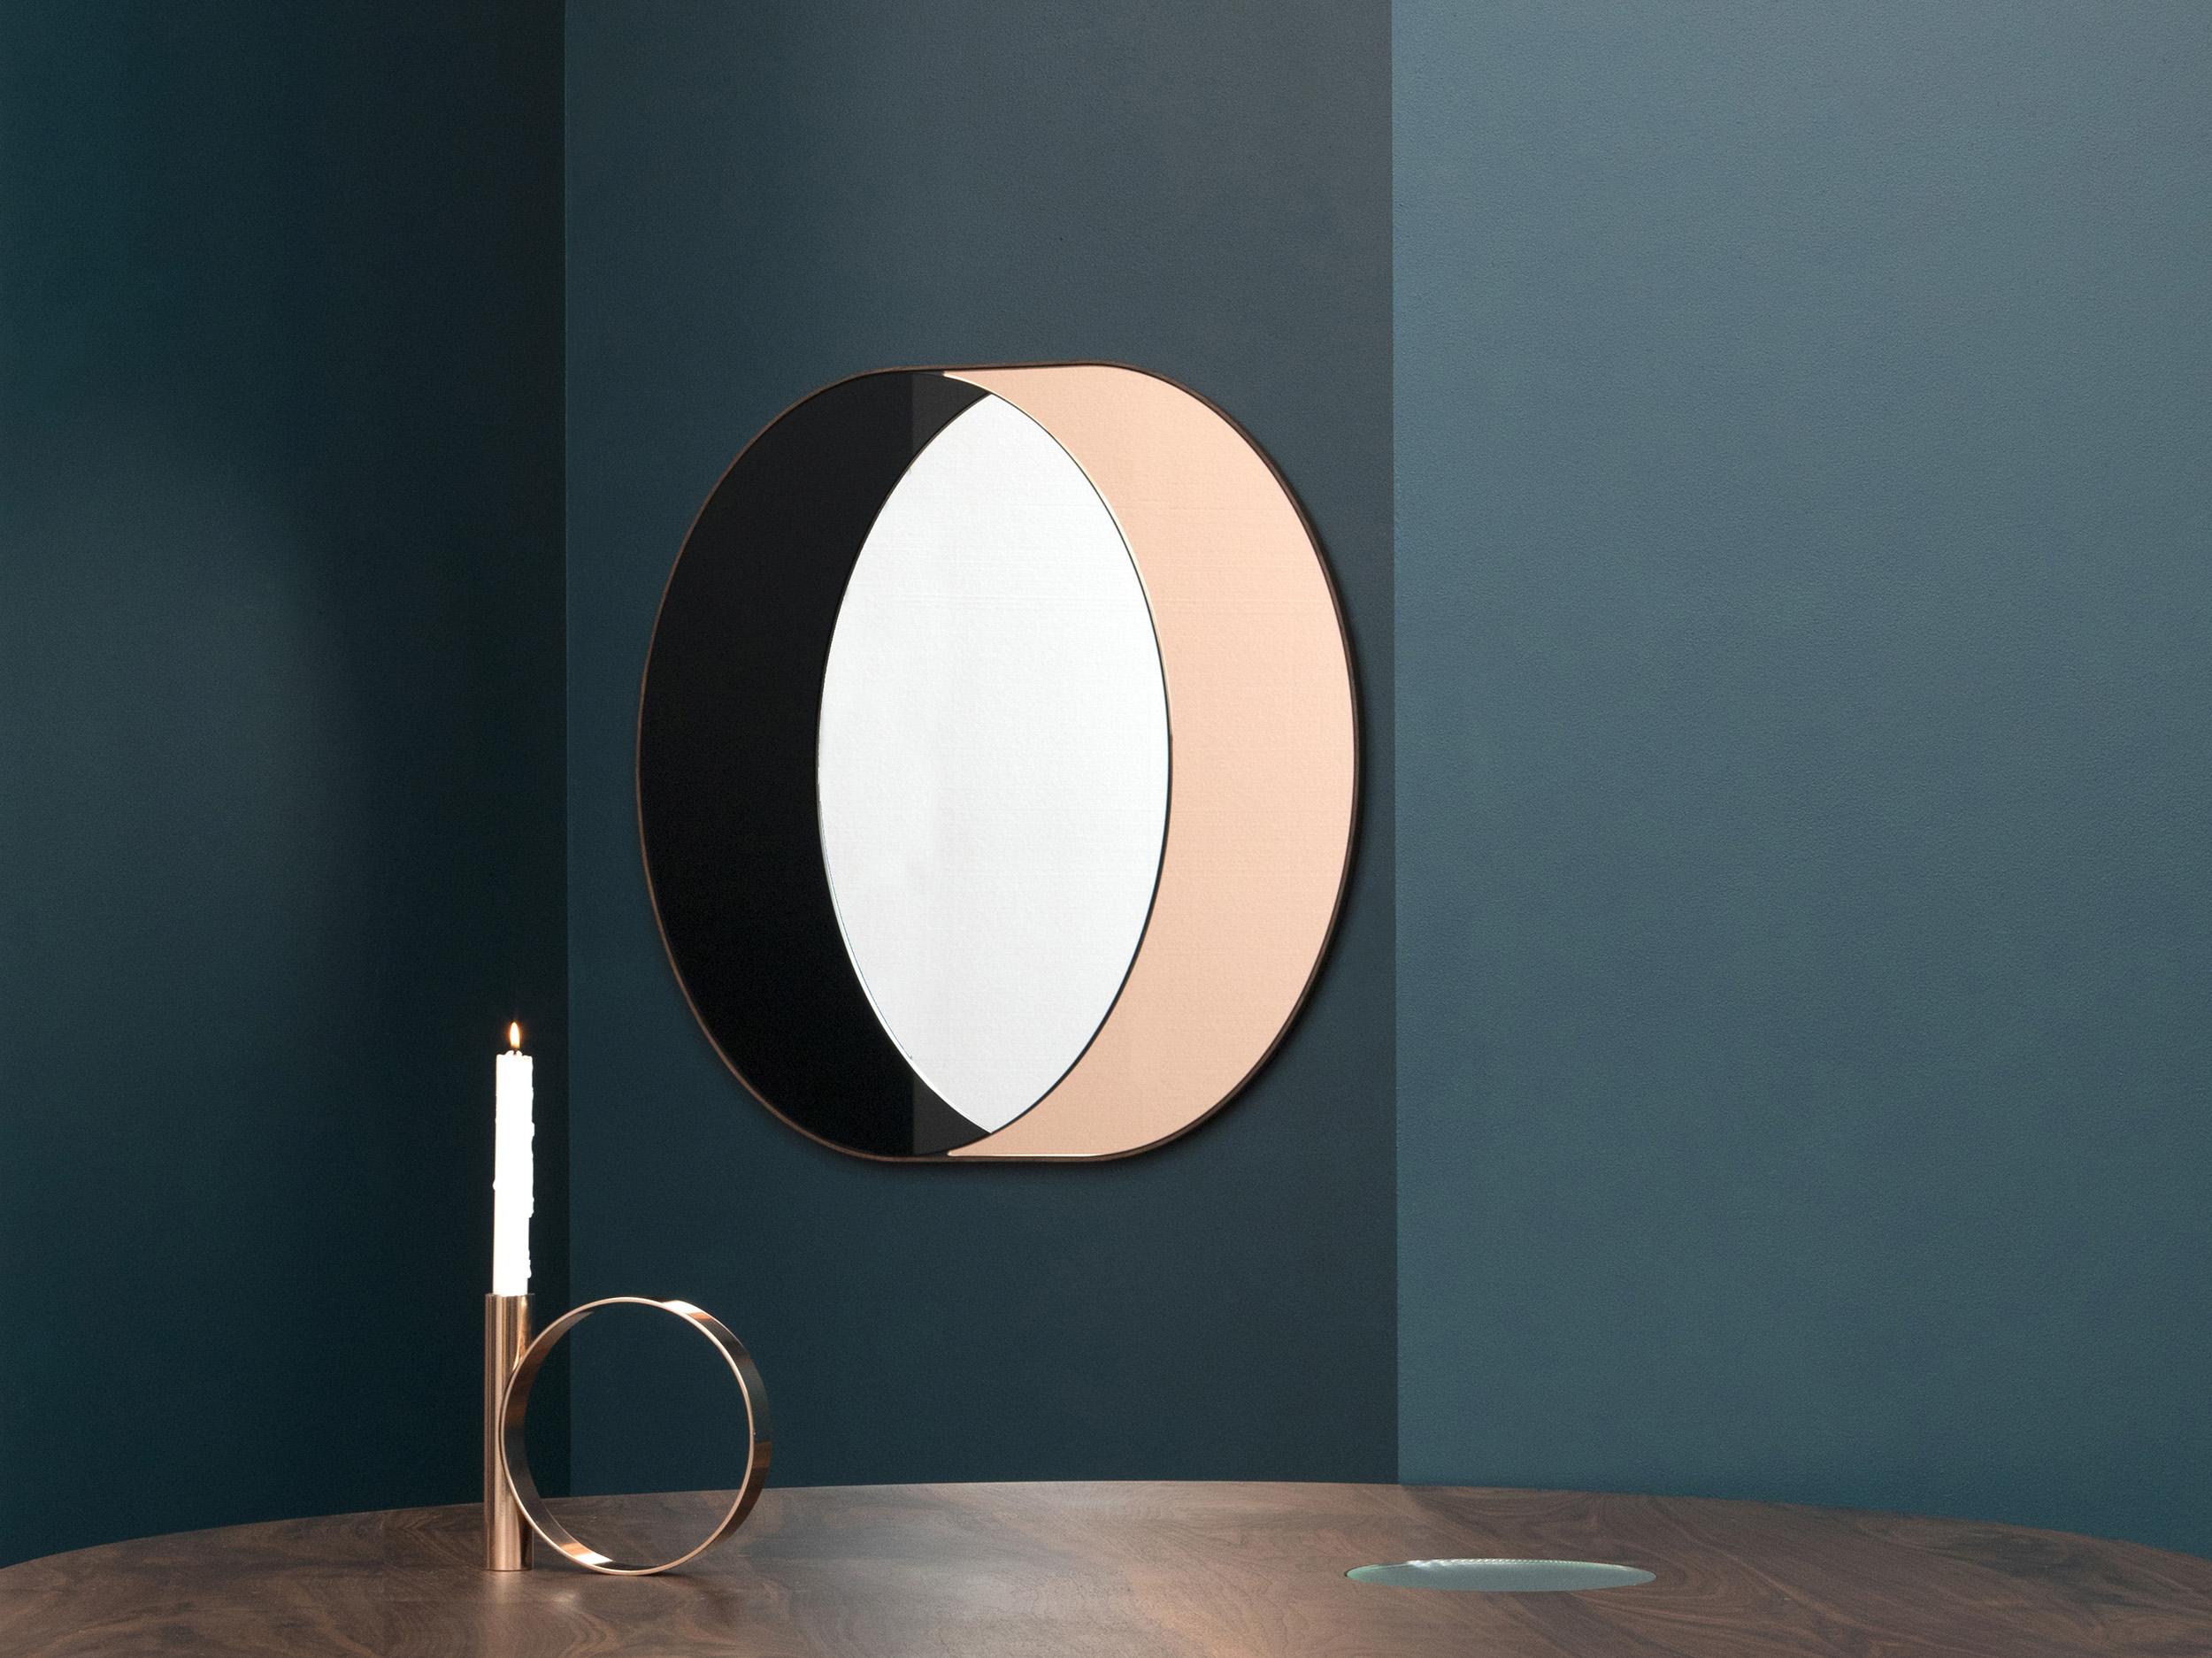 "Ring Mirror, Black, Peach and Clear Mirror, Walnut Frame, 33"" x 31"" x 1"", Photo by Charlie Schuck"